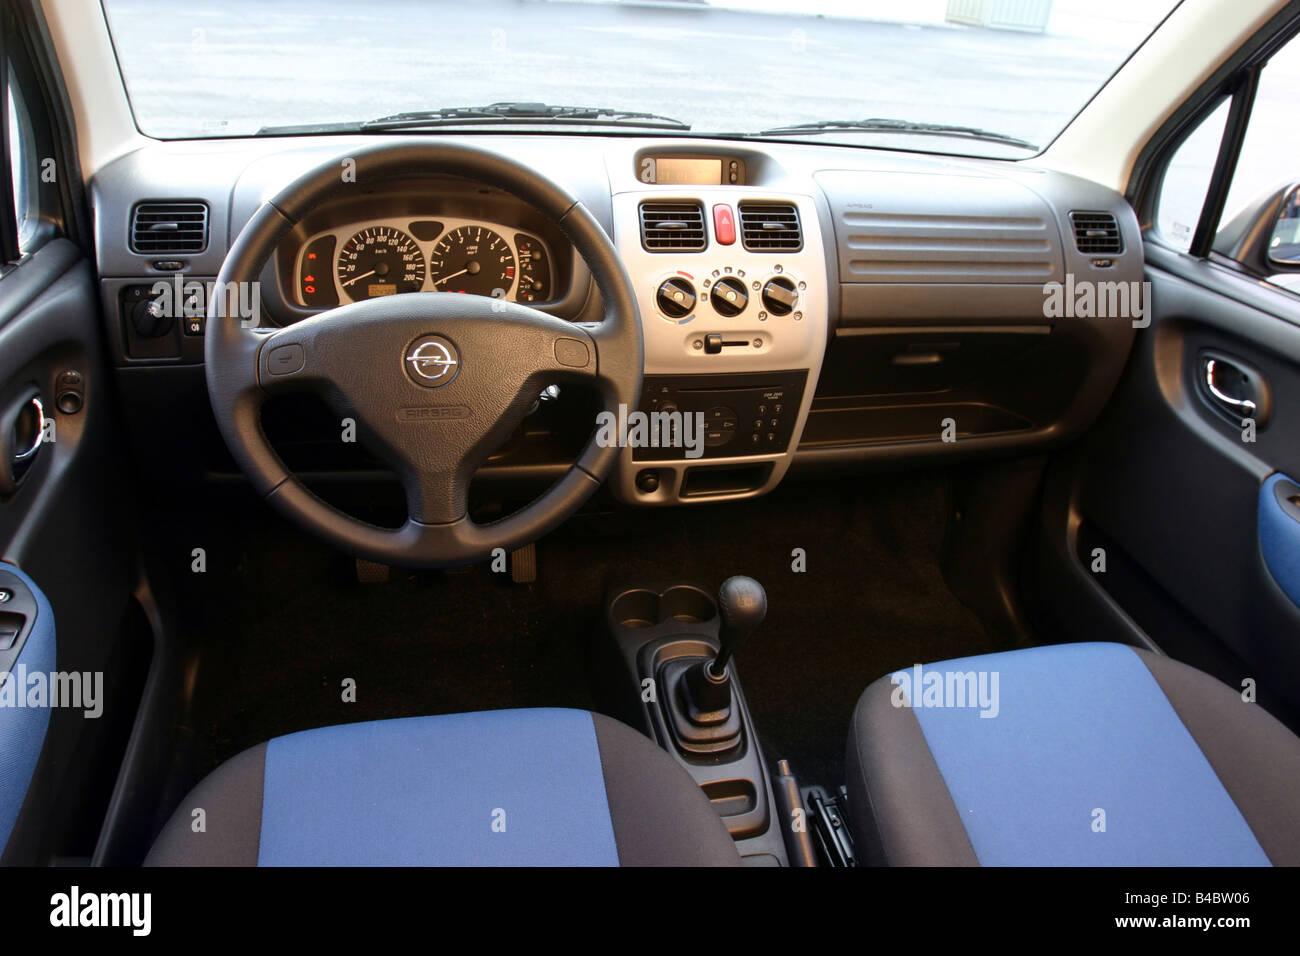 Tremendous Interieur Opel Agila Photo Online Wiring Diagram Wiring Database Wedabyuccorg